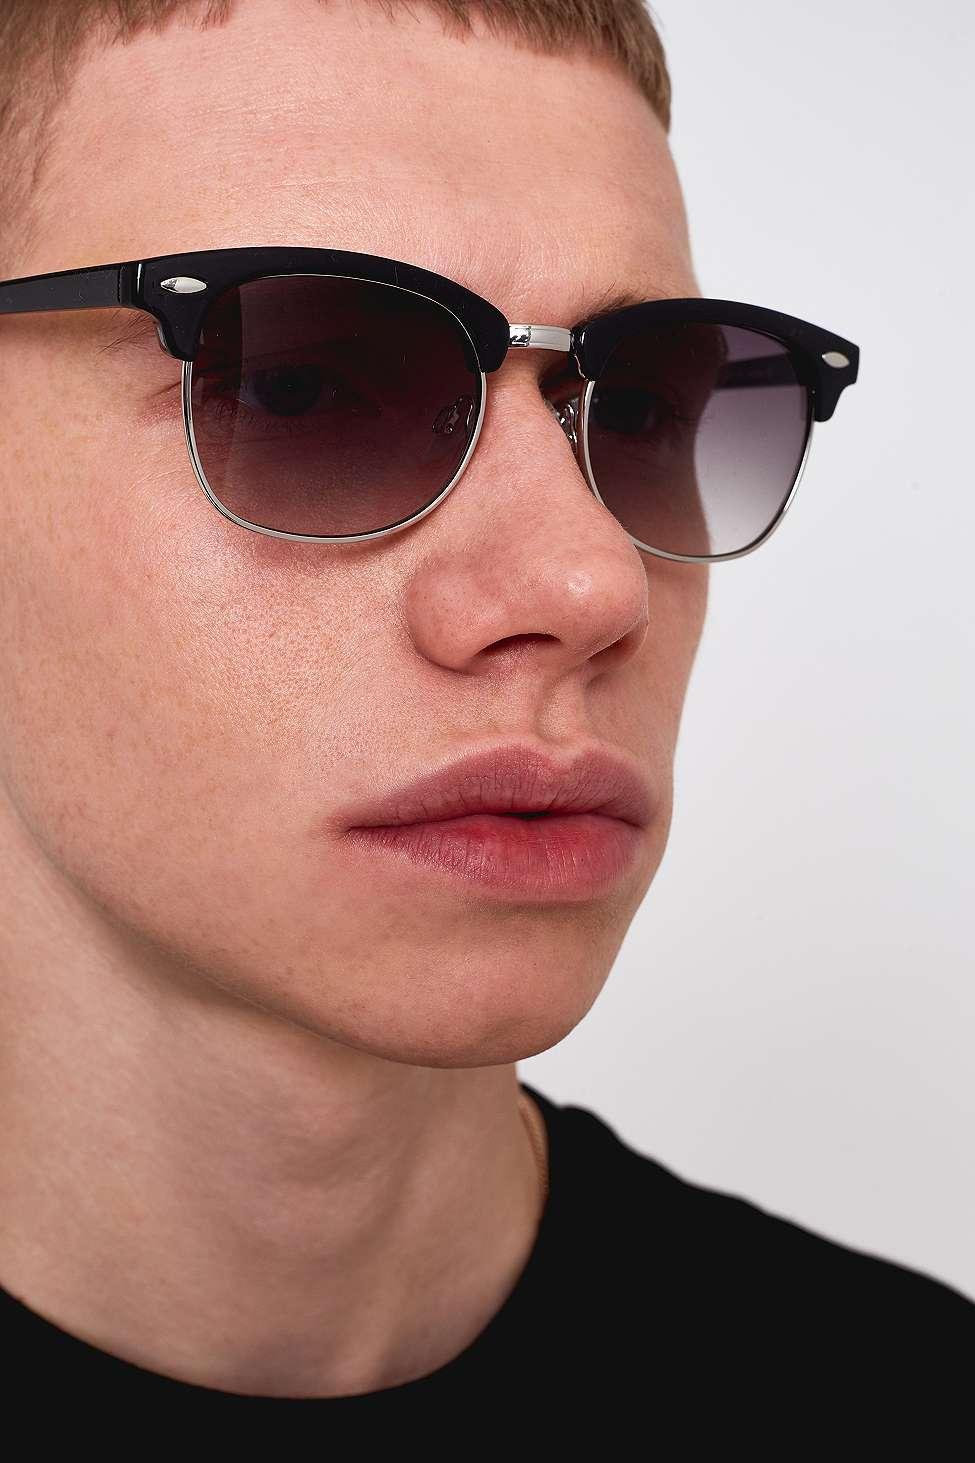 f1e52fab4e095 Urban Outfitters Uo Club Black Sunglasses - Mens All in Black for ...